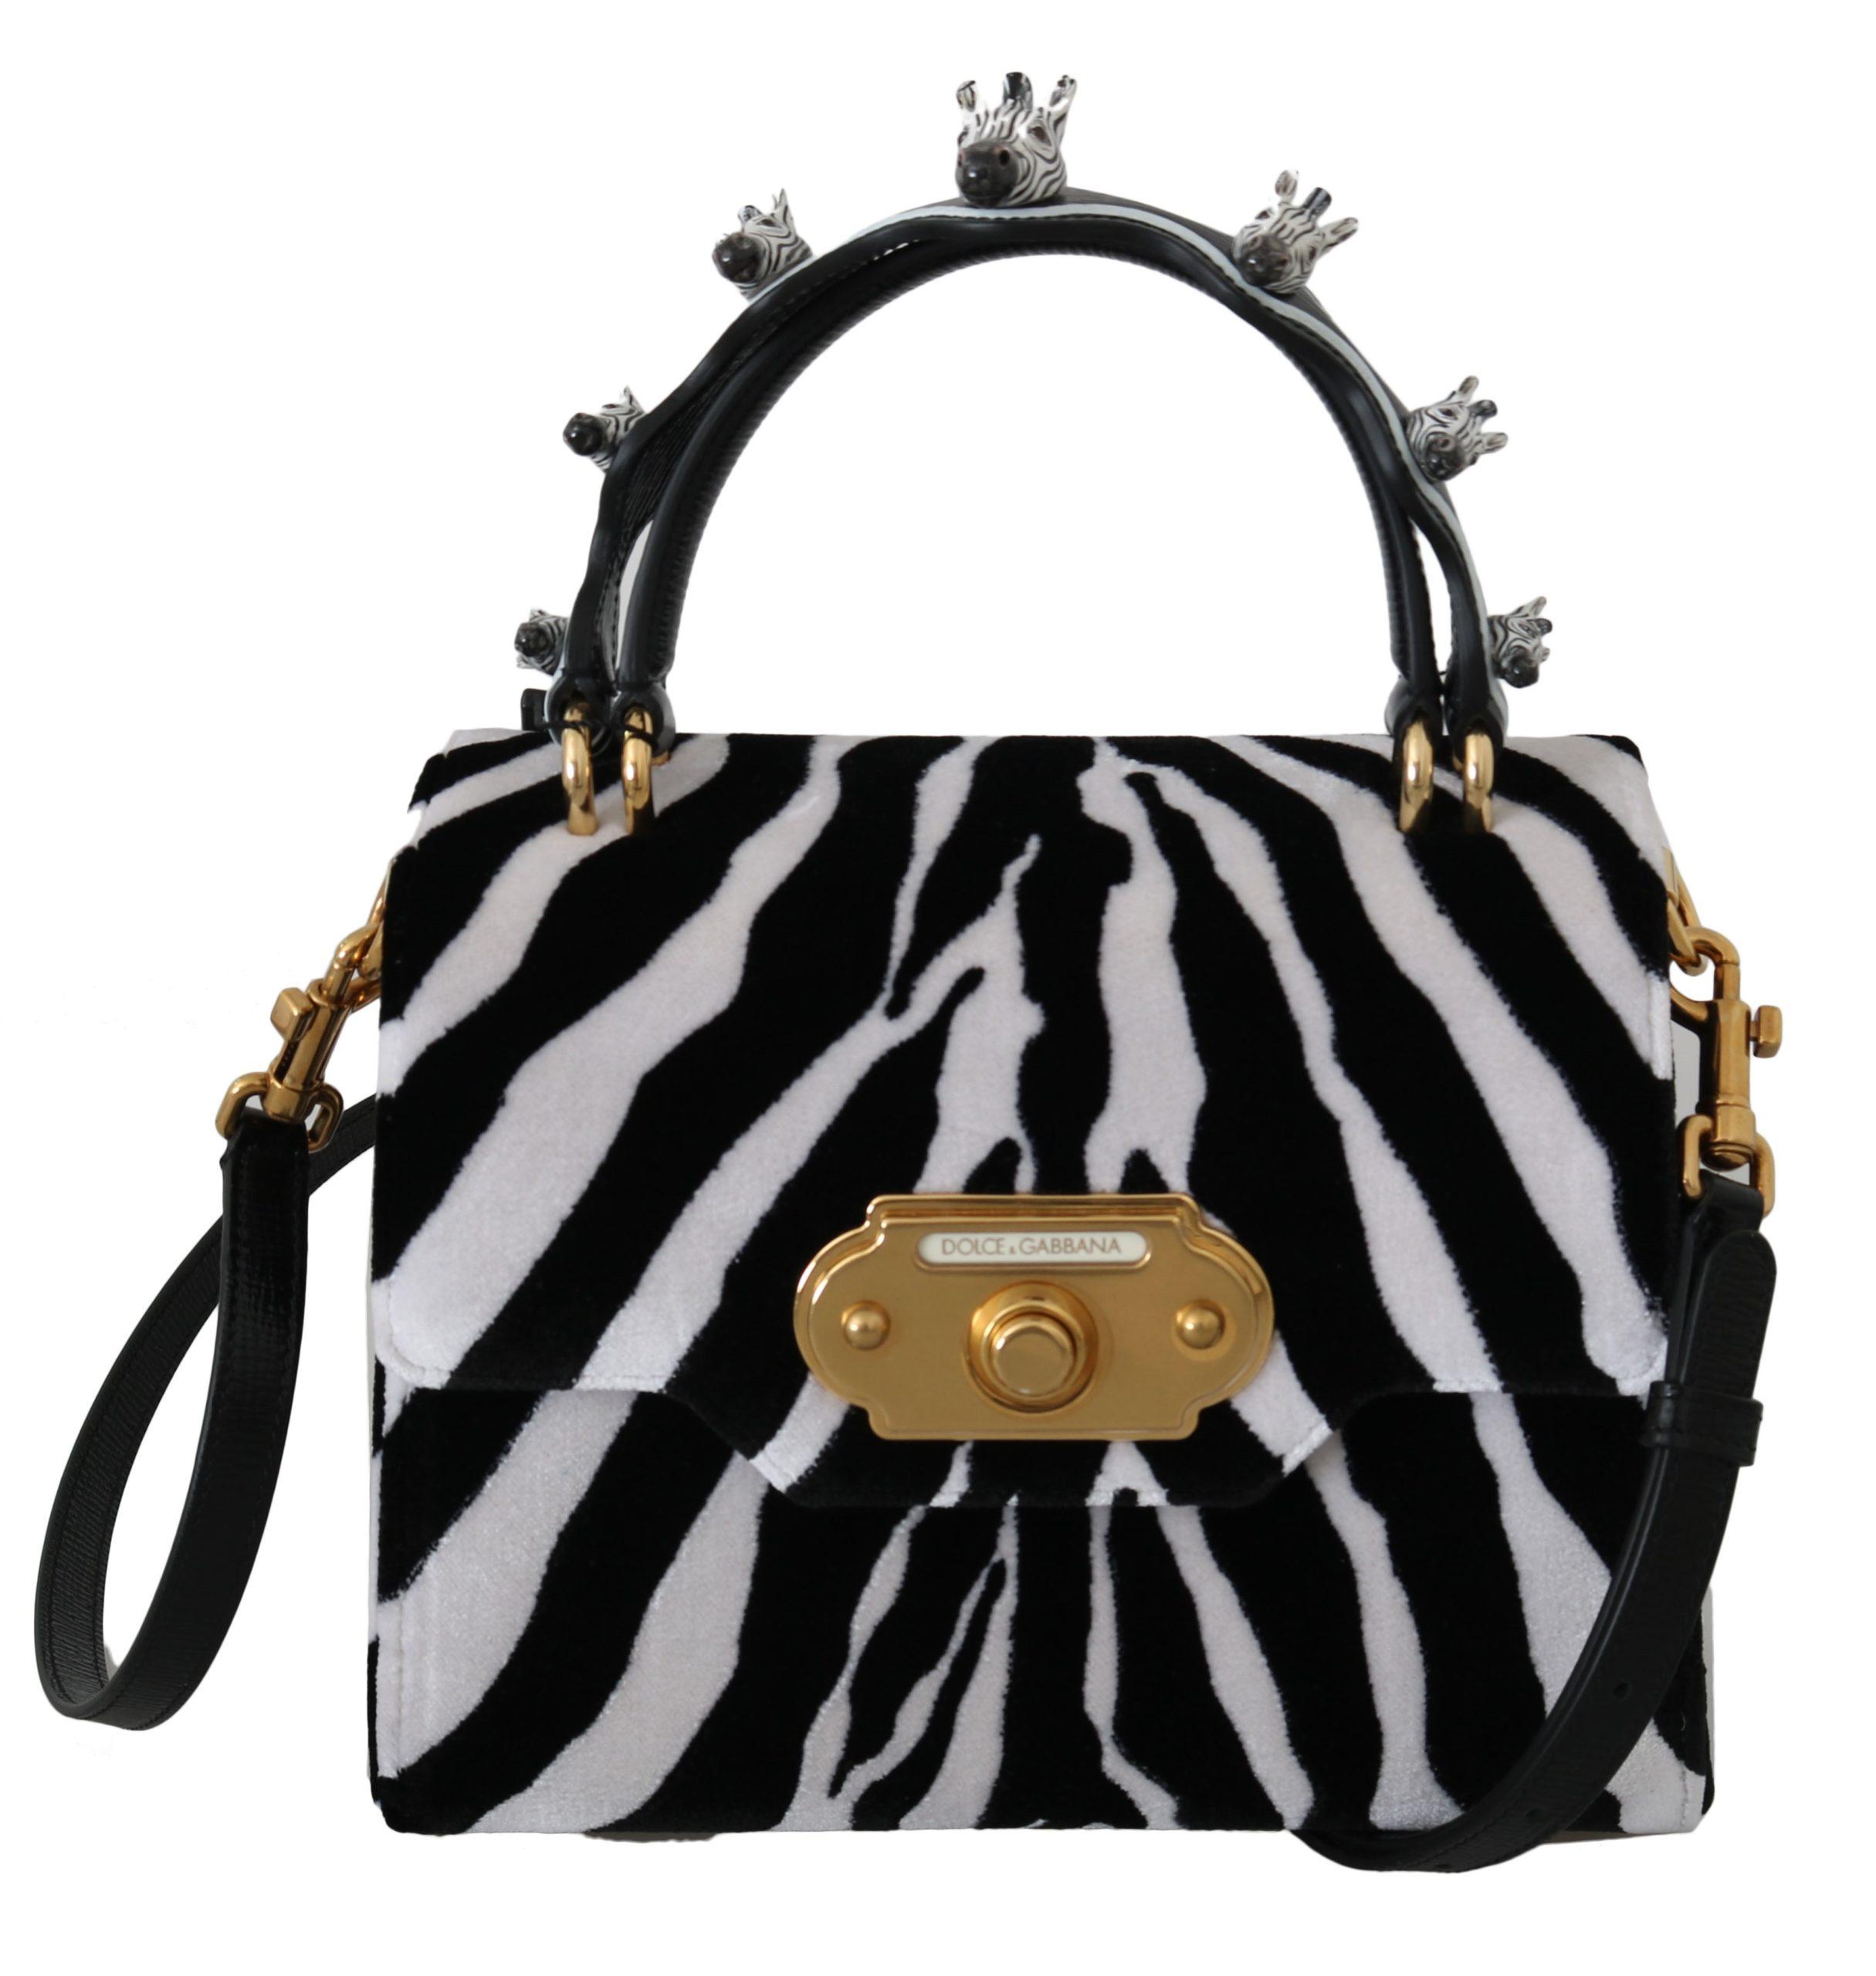 Dolce & Gabbana Women's Zebra WELCOME Handbag Multicolor VA8816